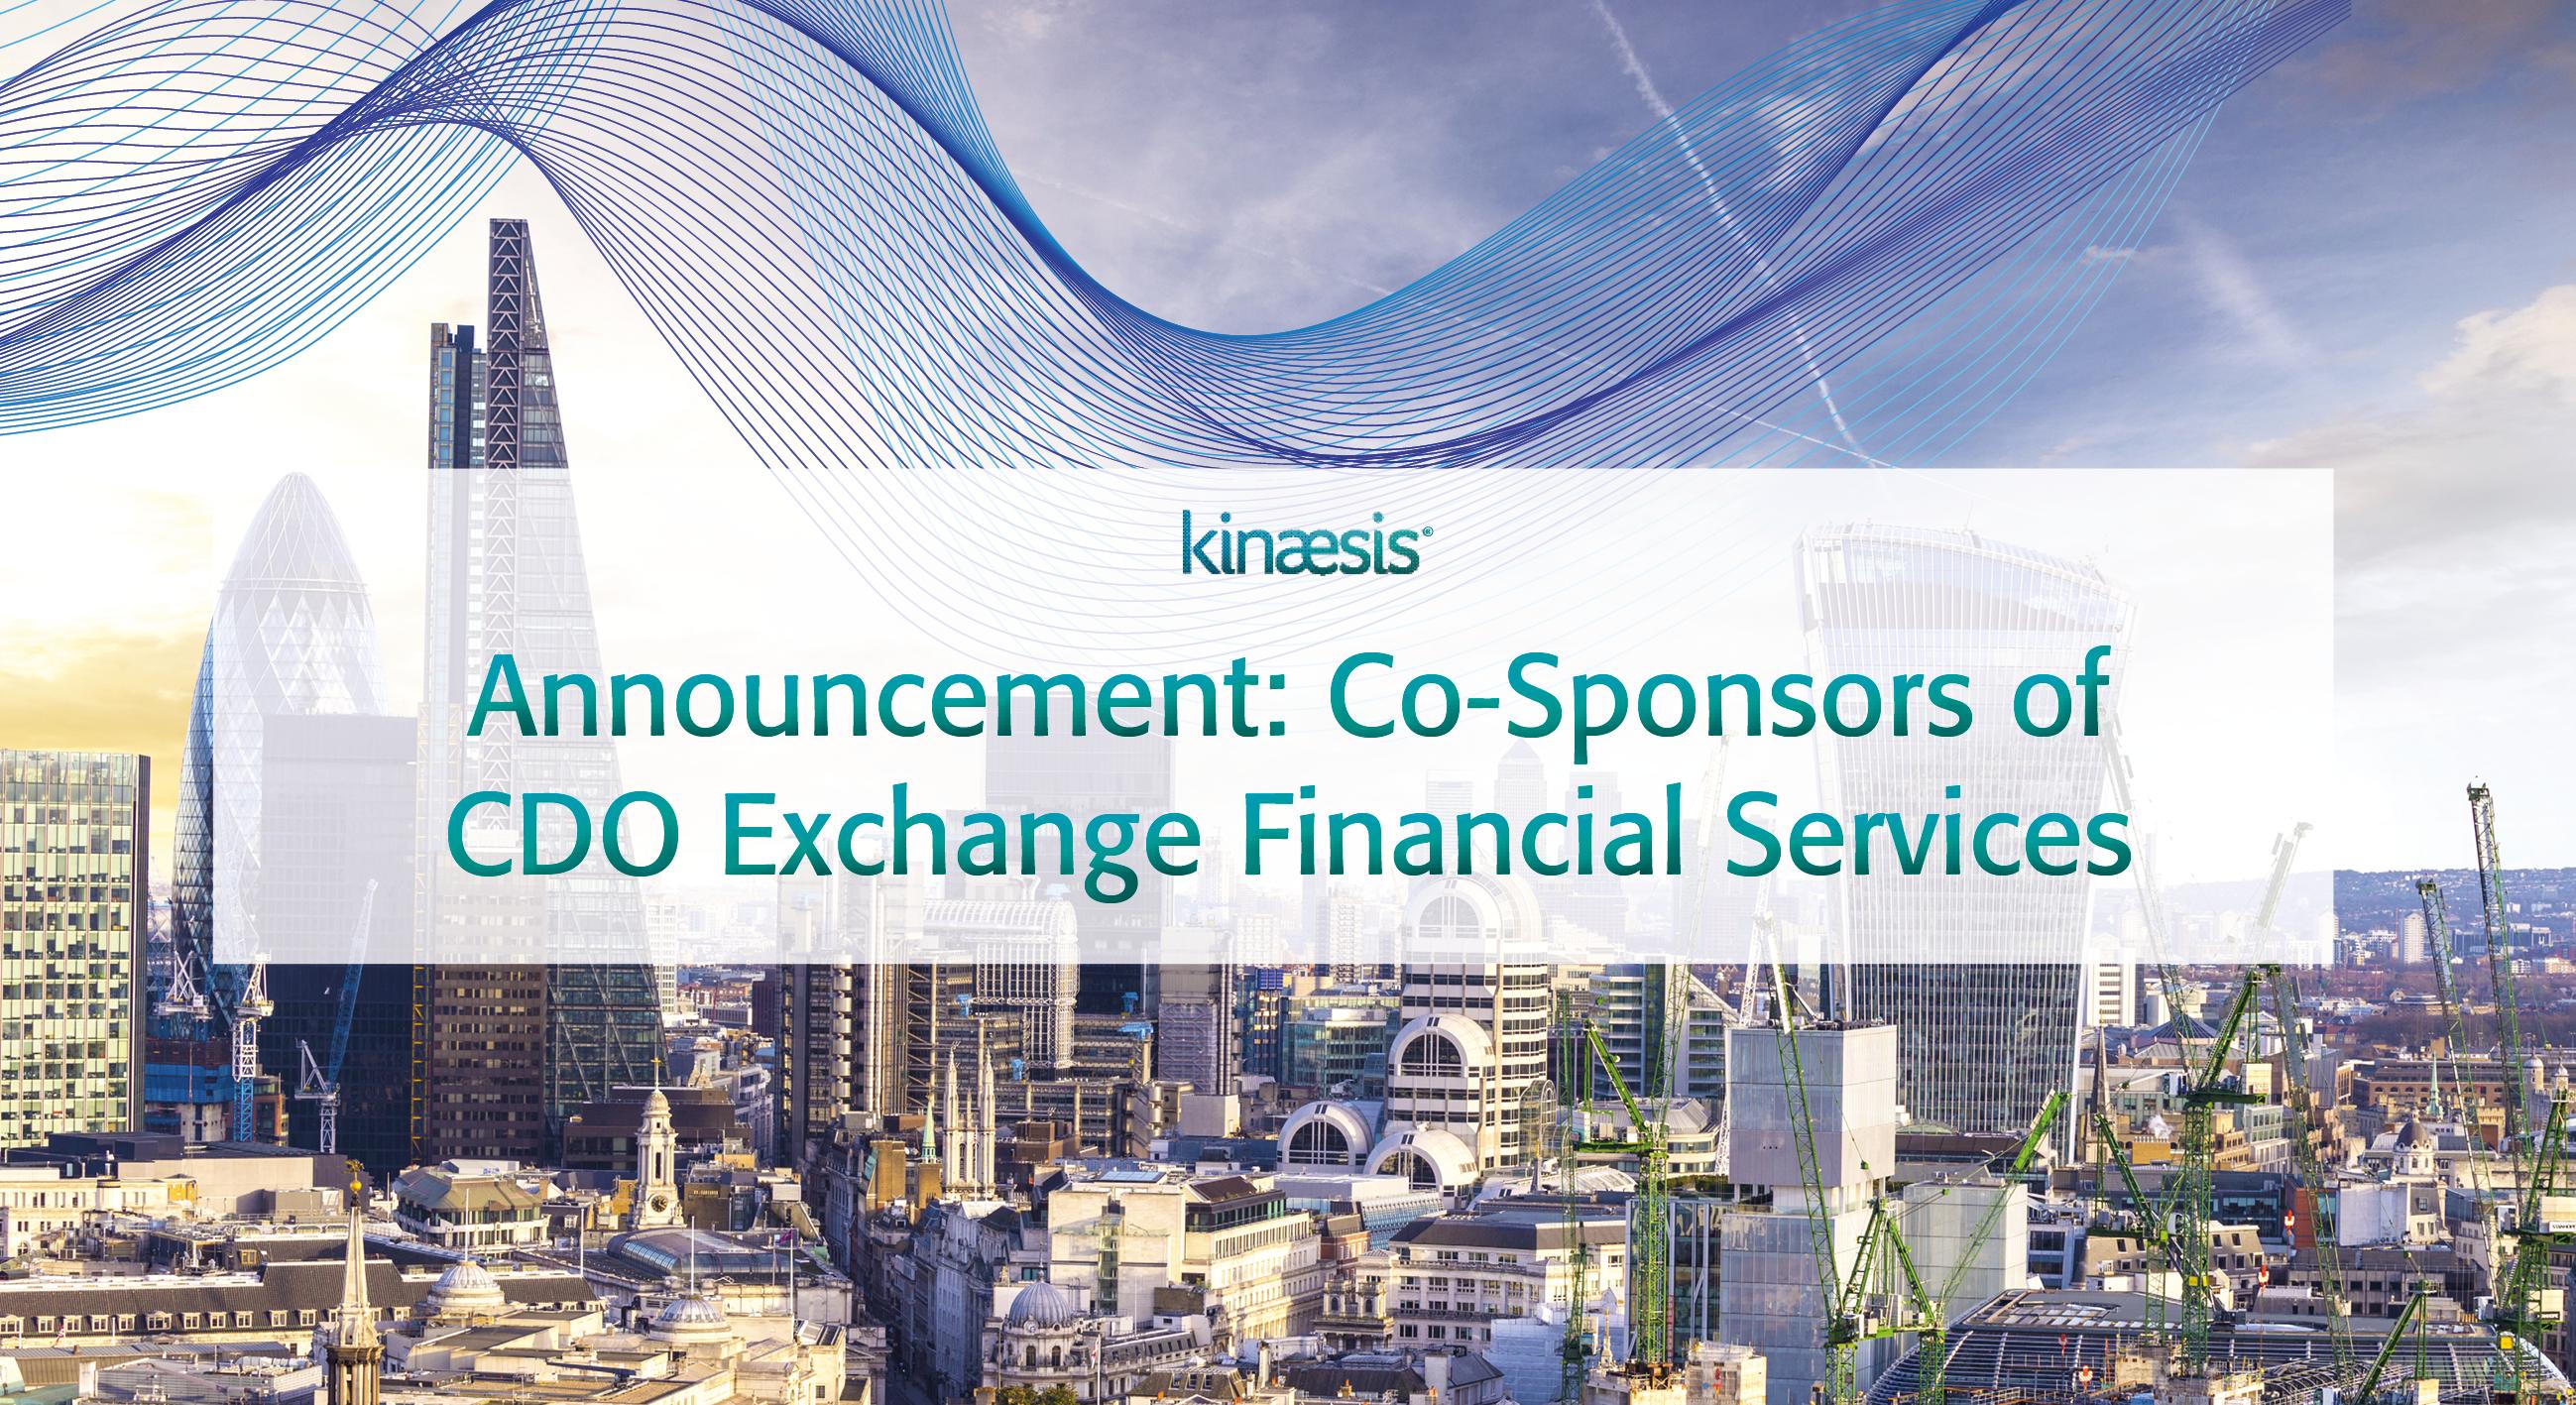 Kinaesis Sponsors CDO Exchange